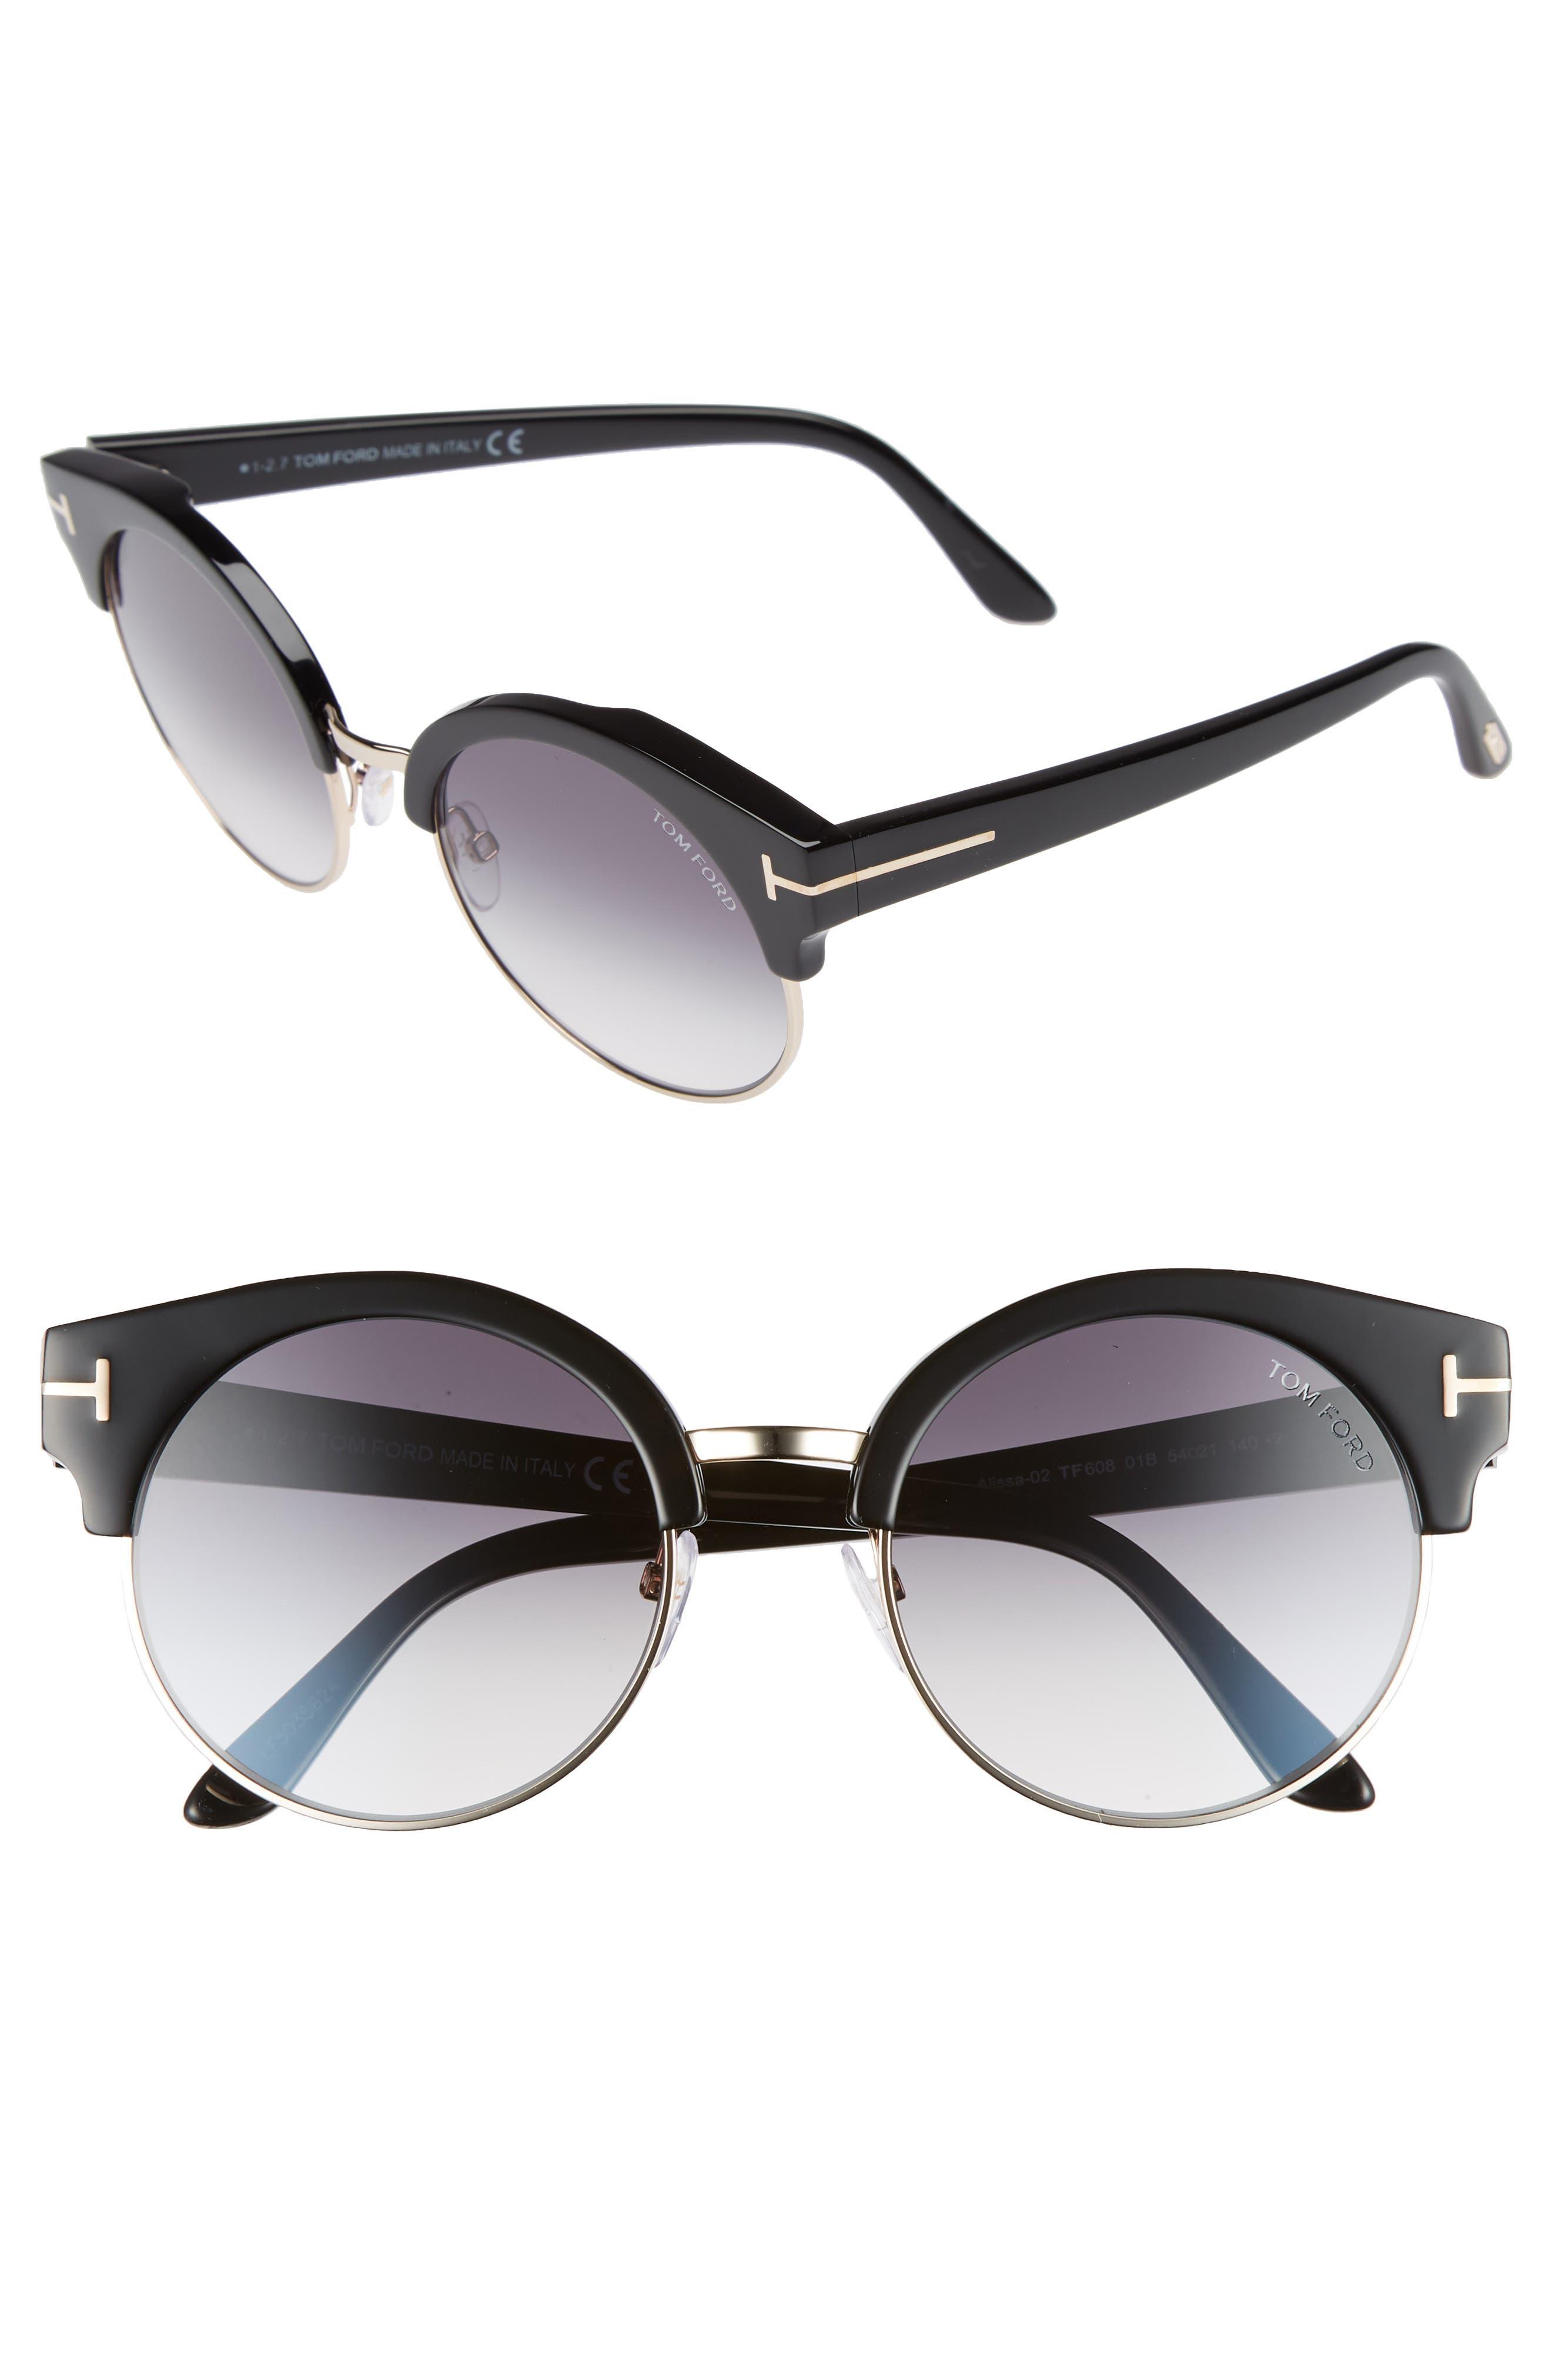 Alissa 54mm Sunglasses,                             Main thumbnail 1, color,                             012